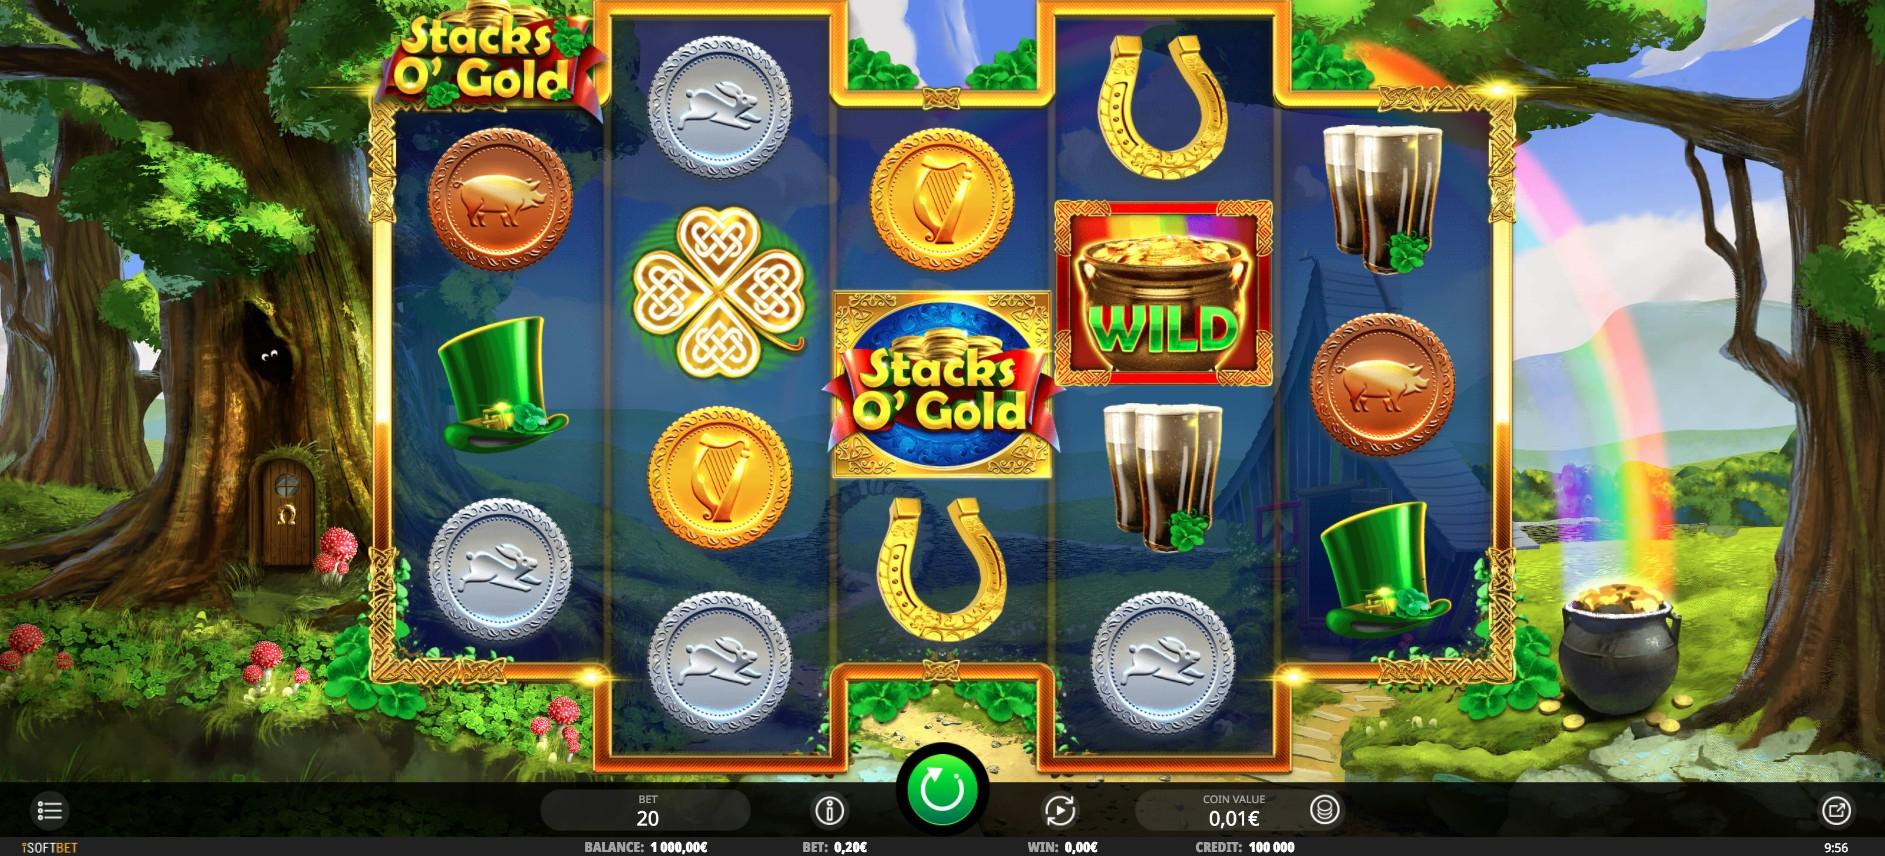 stacks-o-gold